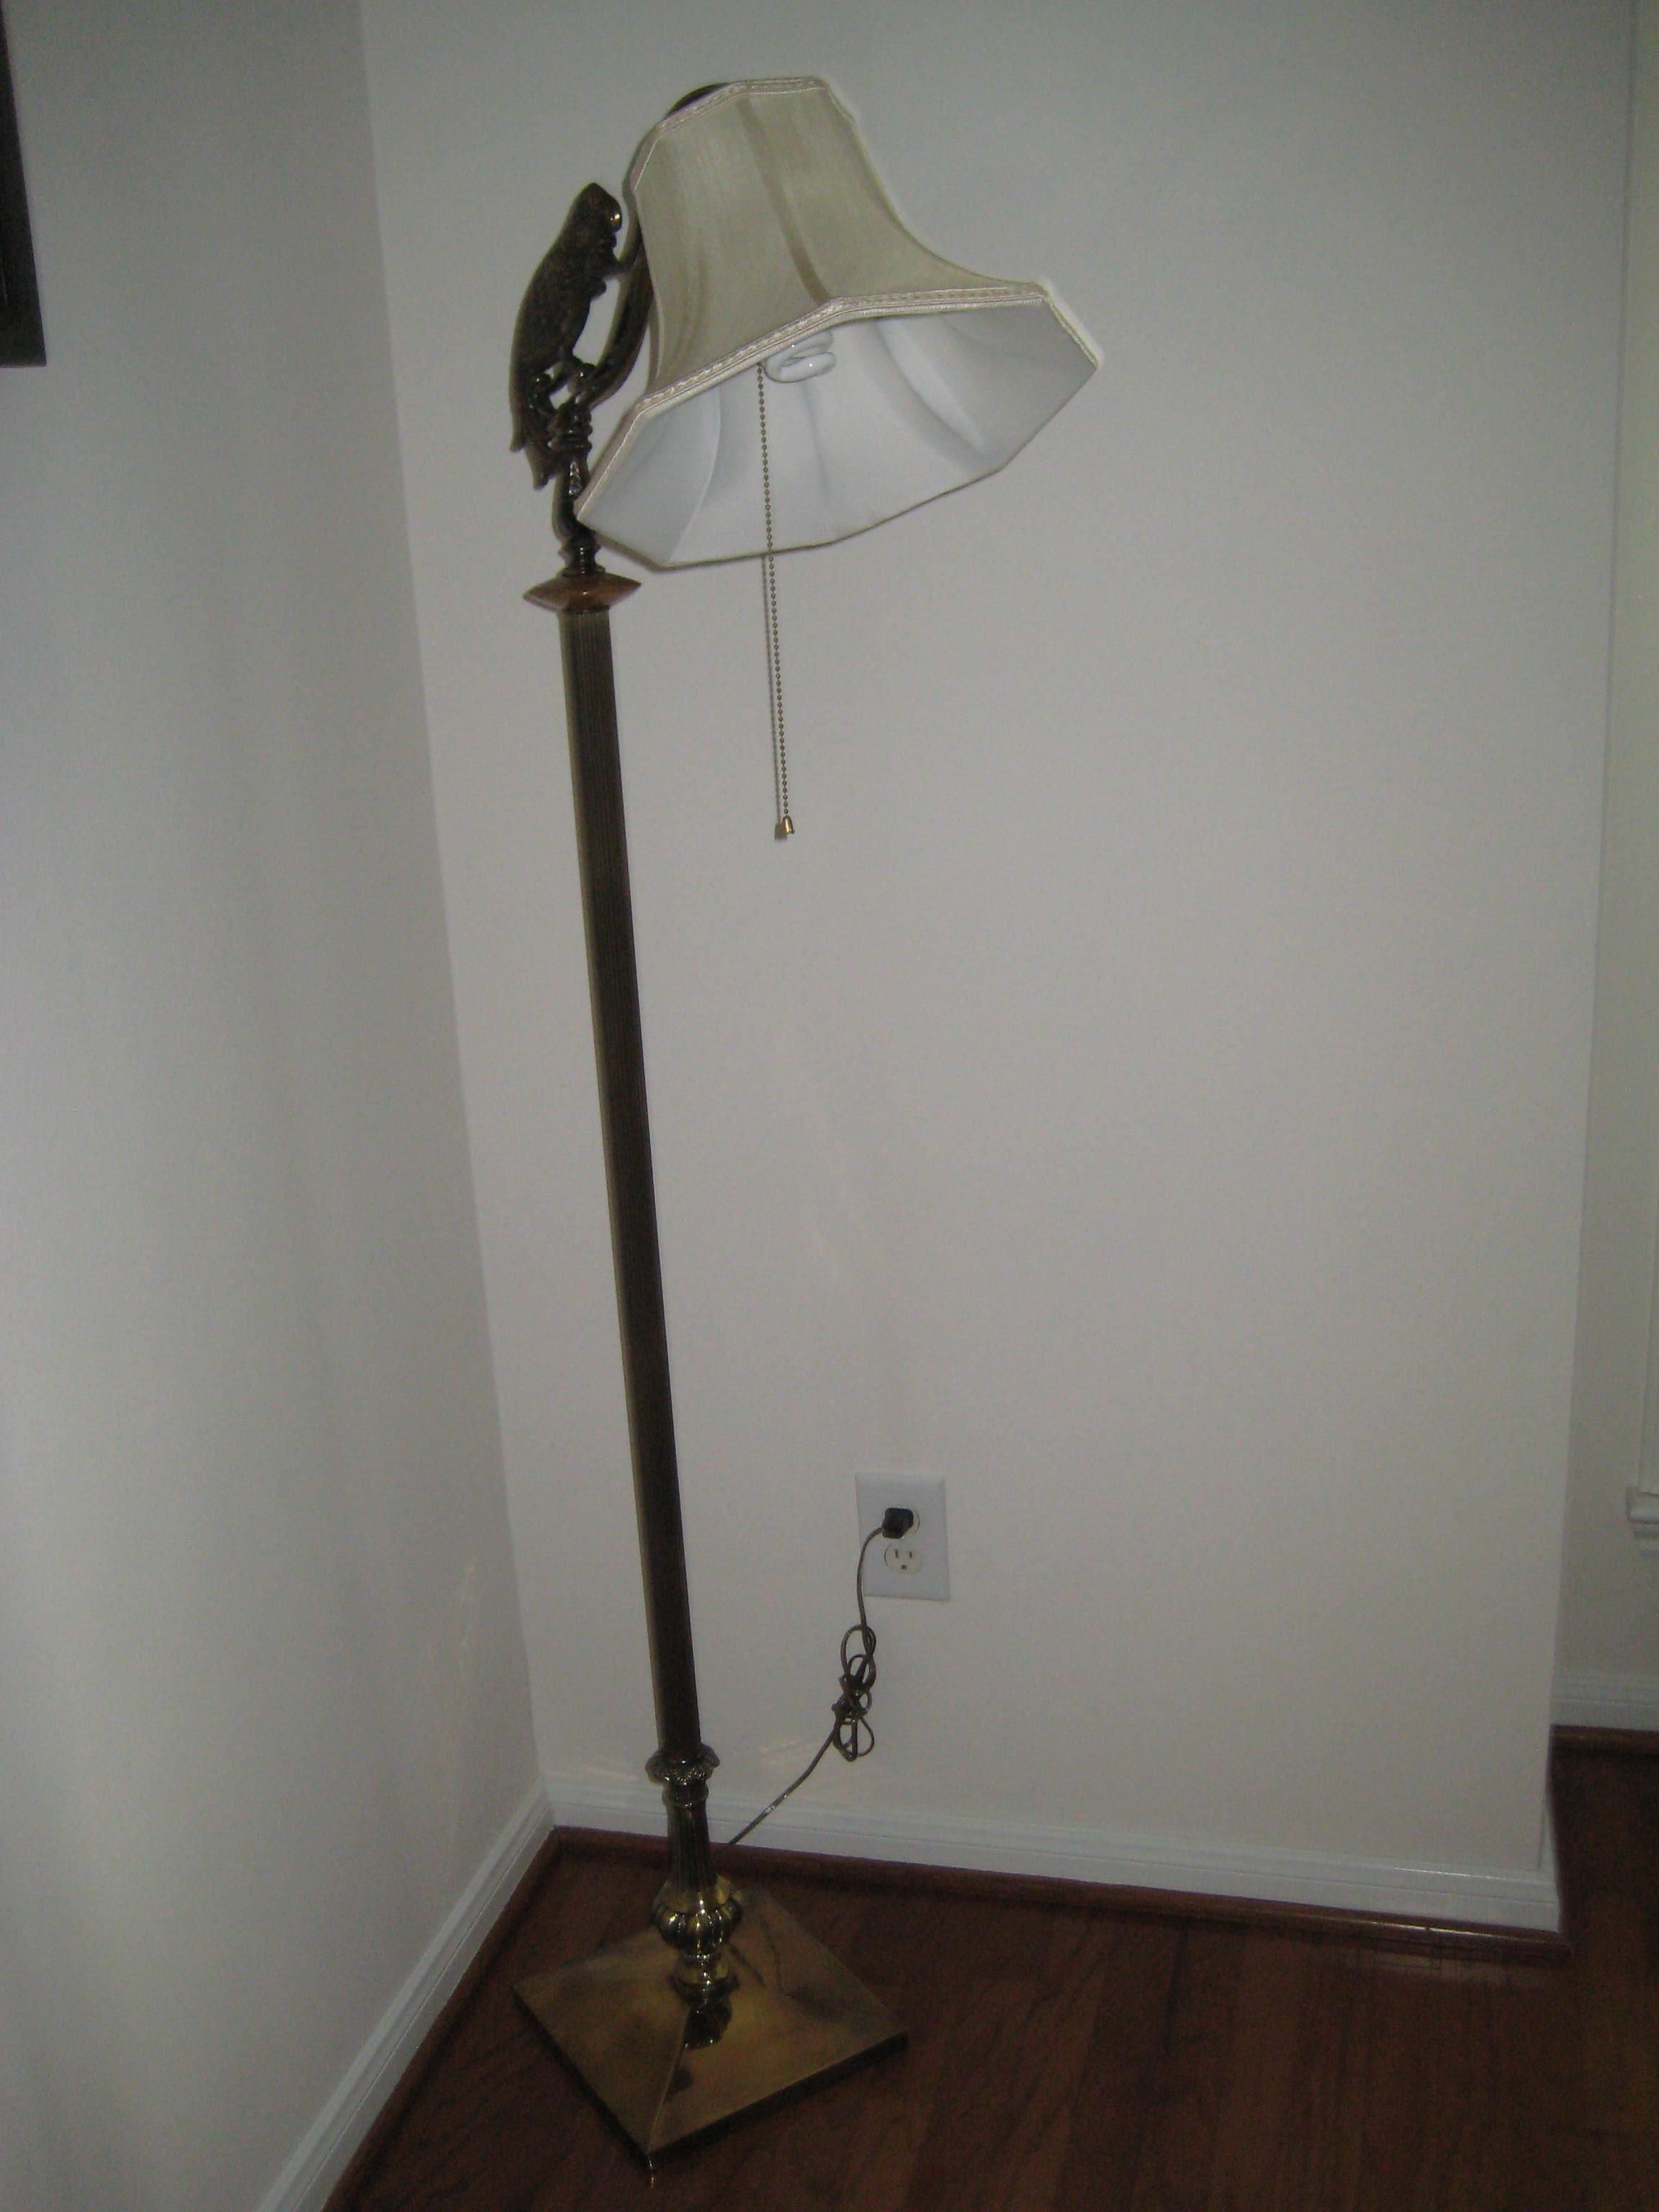 parrot arm bridgelamp plus shade for sale classifieds. Black Bedroom Furniture Sets. Home Design Ideas